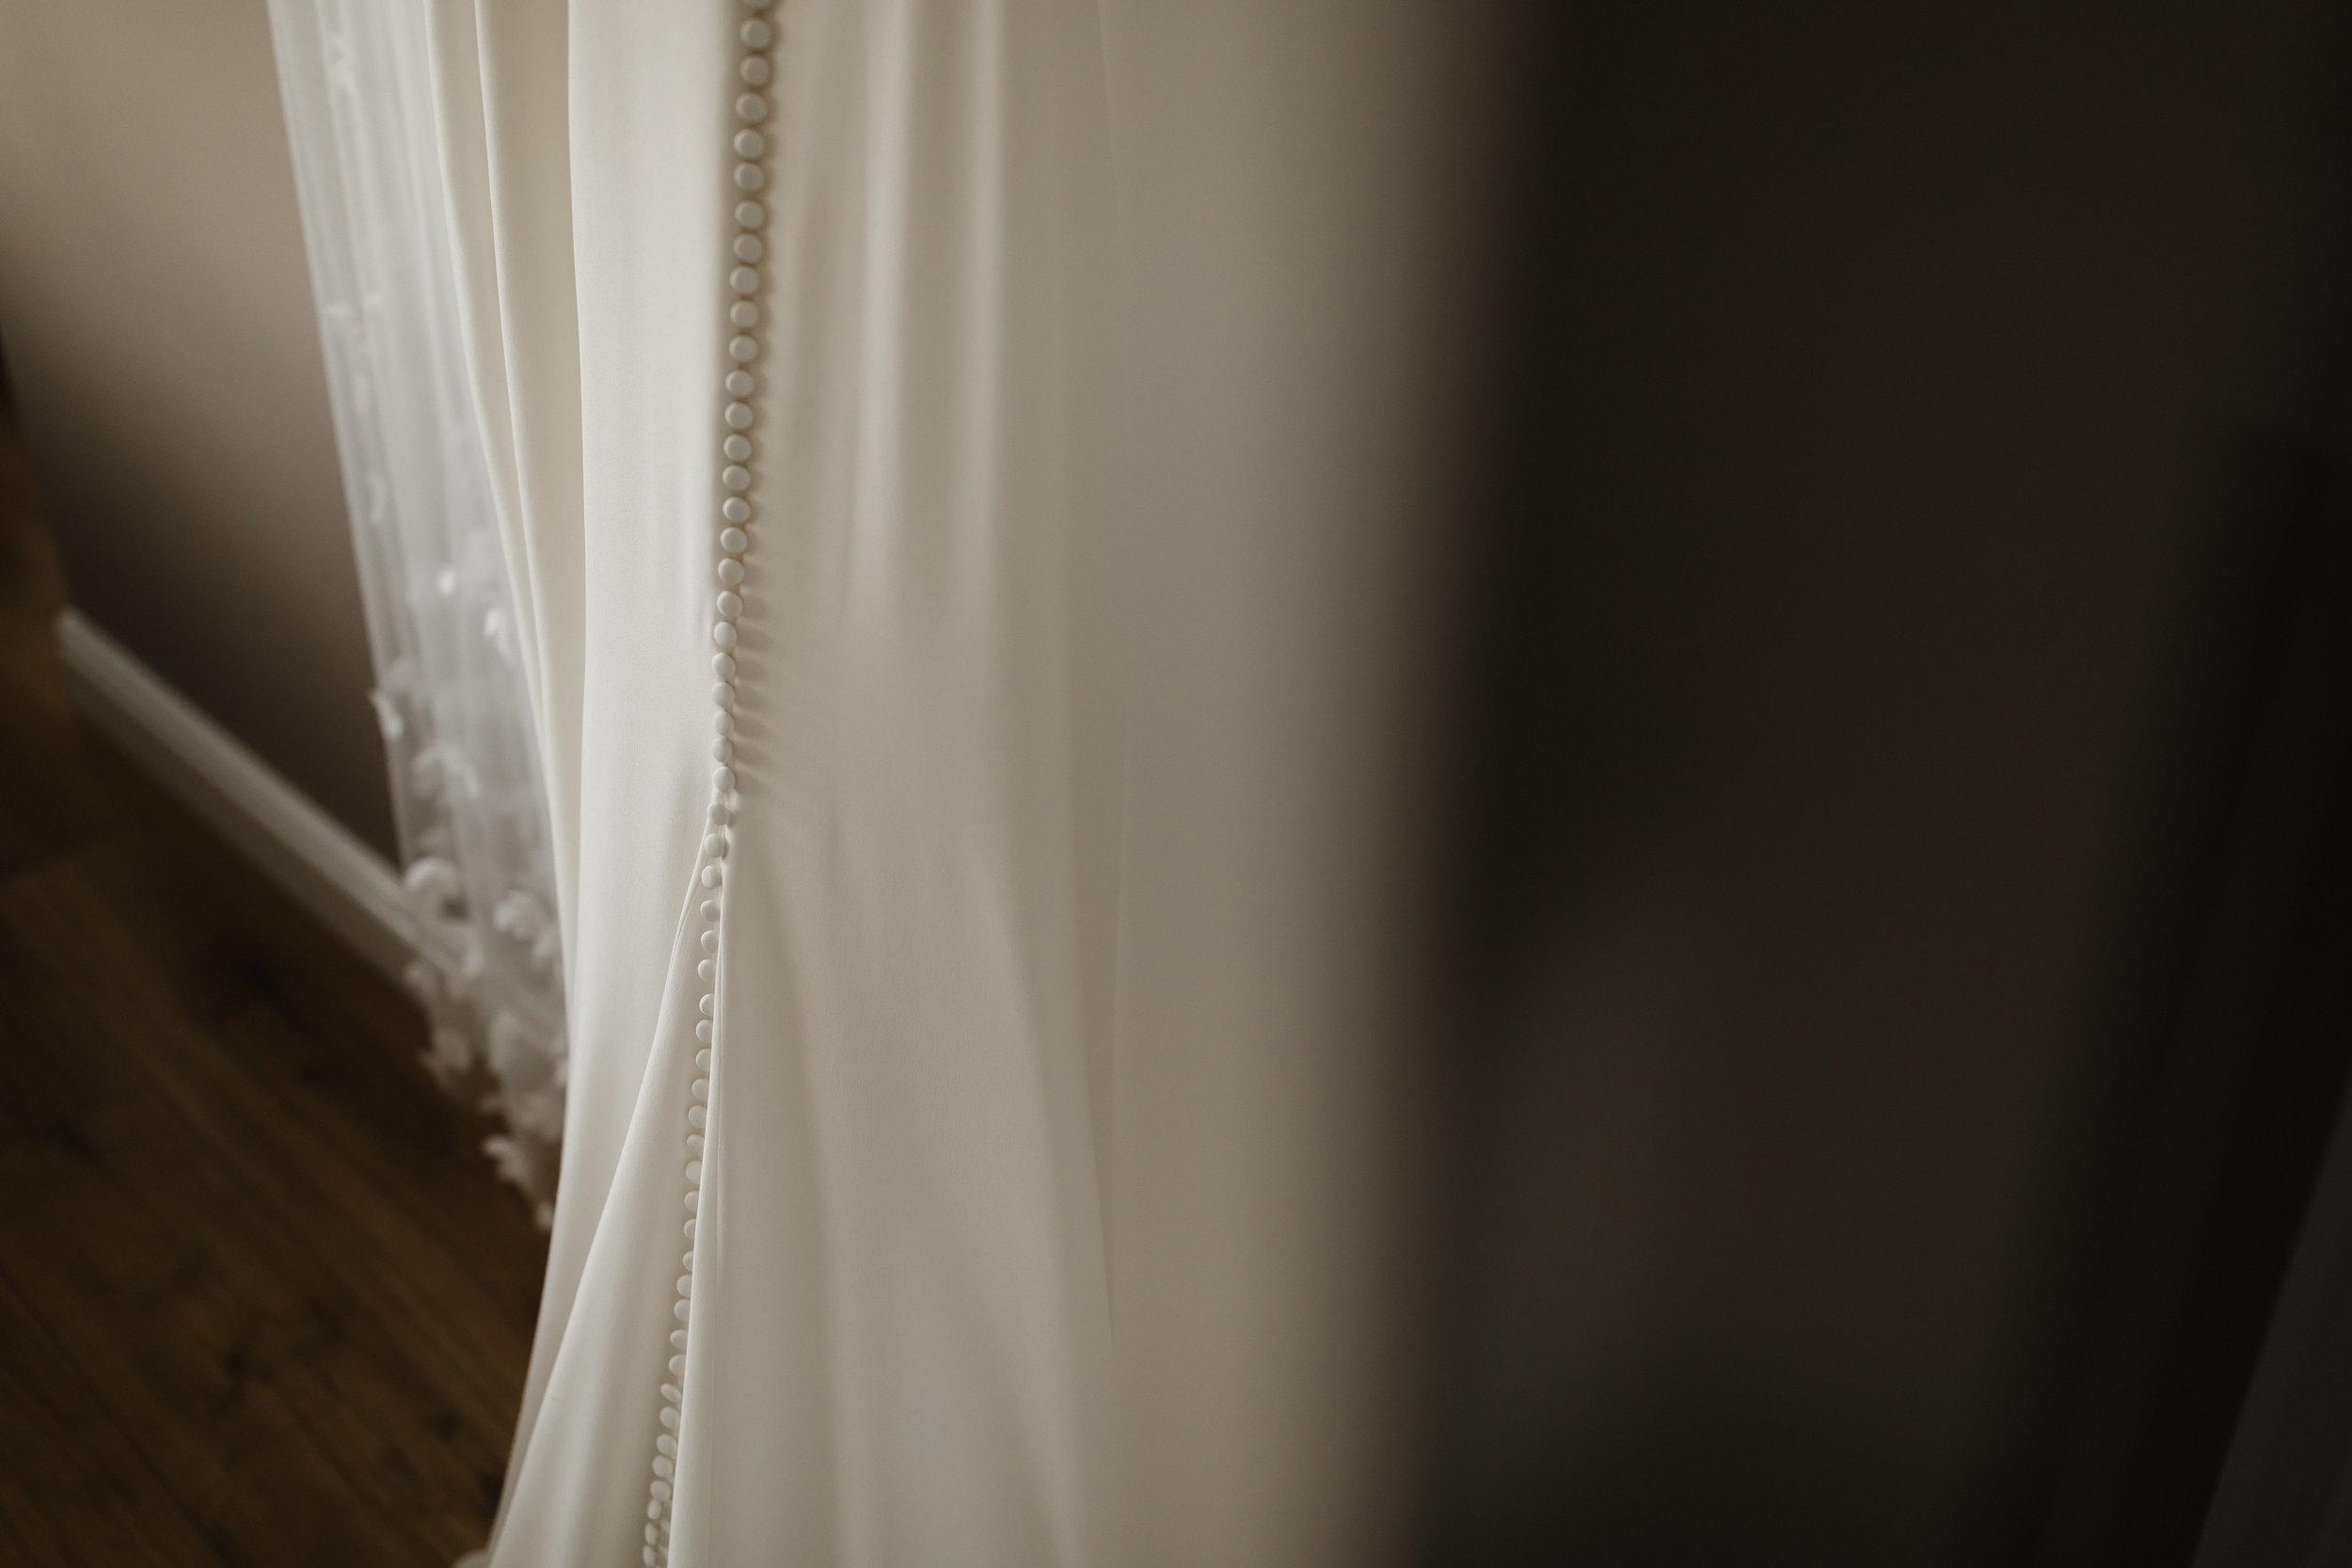 Lauren-Peak-District-Bespoke-Wedding-Gown-Petal-Veil-Train-Long-Sleeve-Susanna-Greening-Designs-Matlock-Derbyshire-5